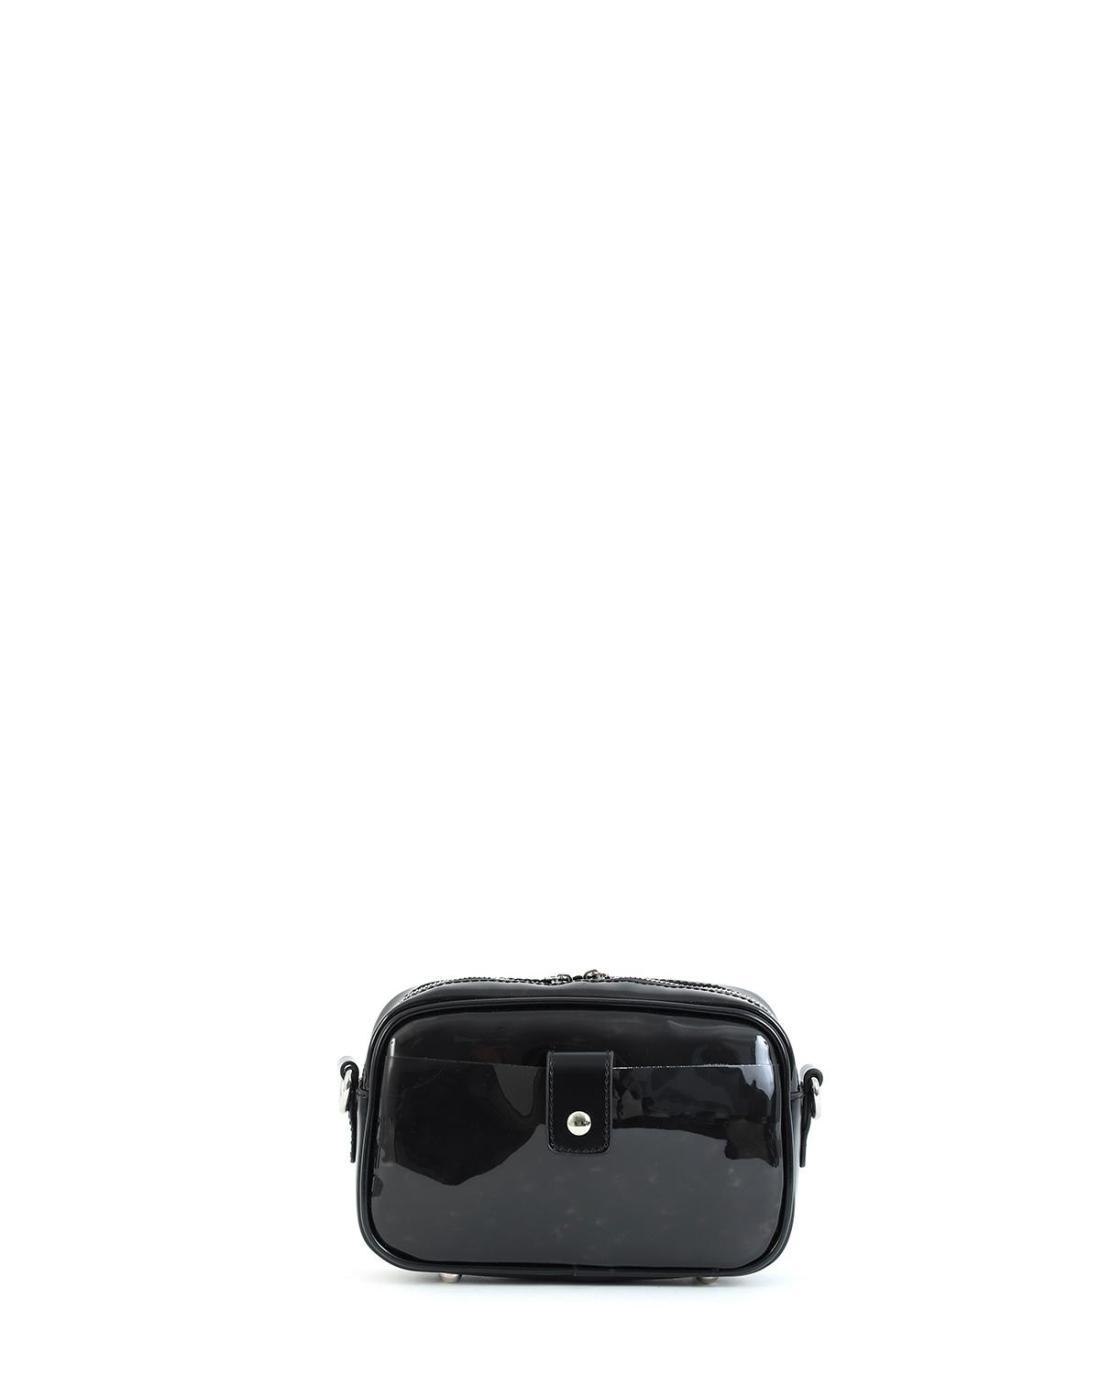 Black cross body bag